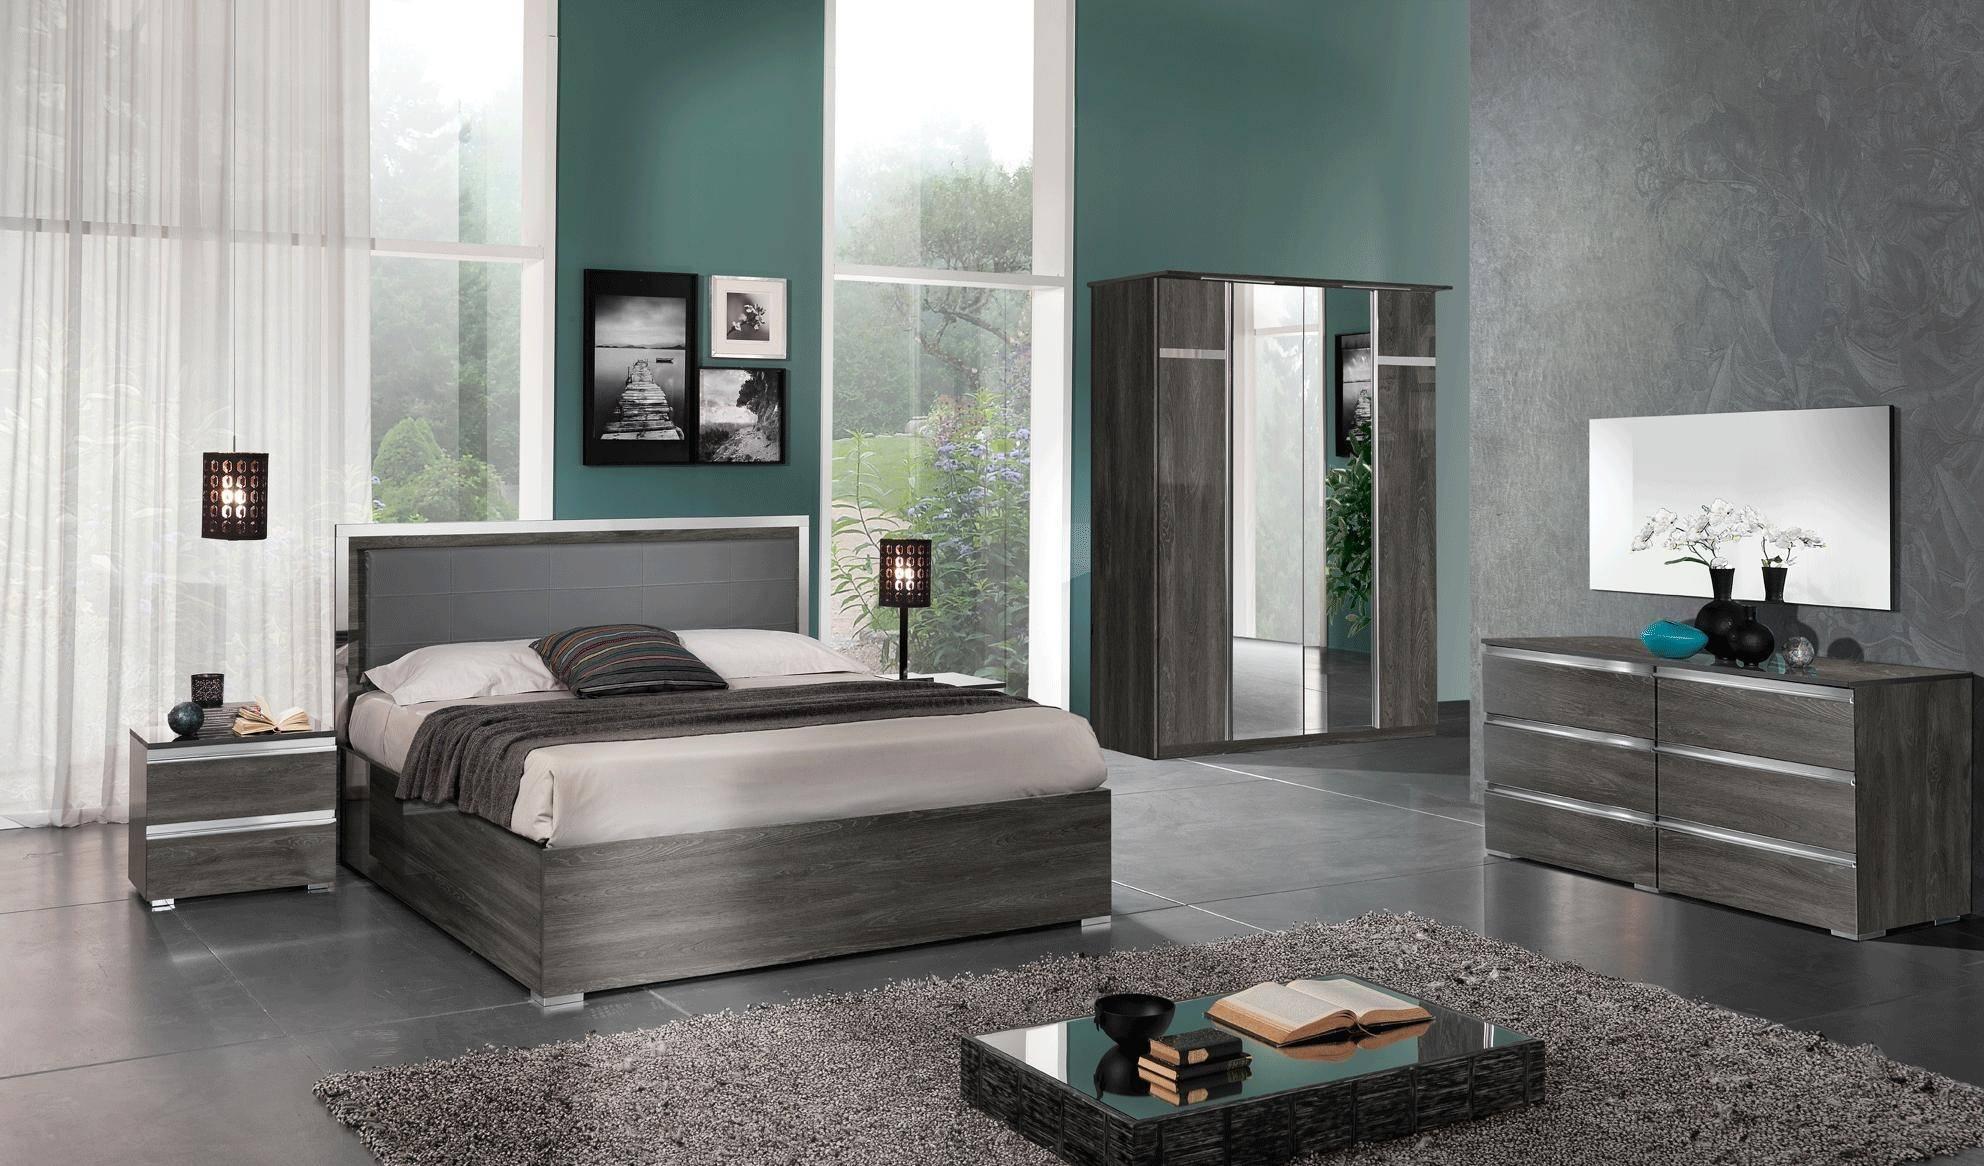 ESF Oxford Queen Platform Bedroom Set 5 Pcs in Gray, Wash Oak, Eco Leather